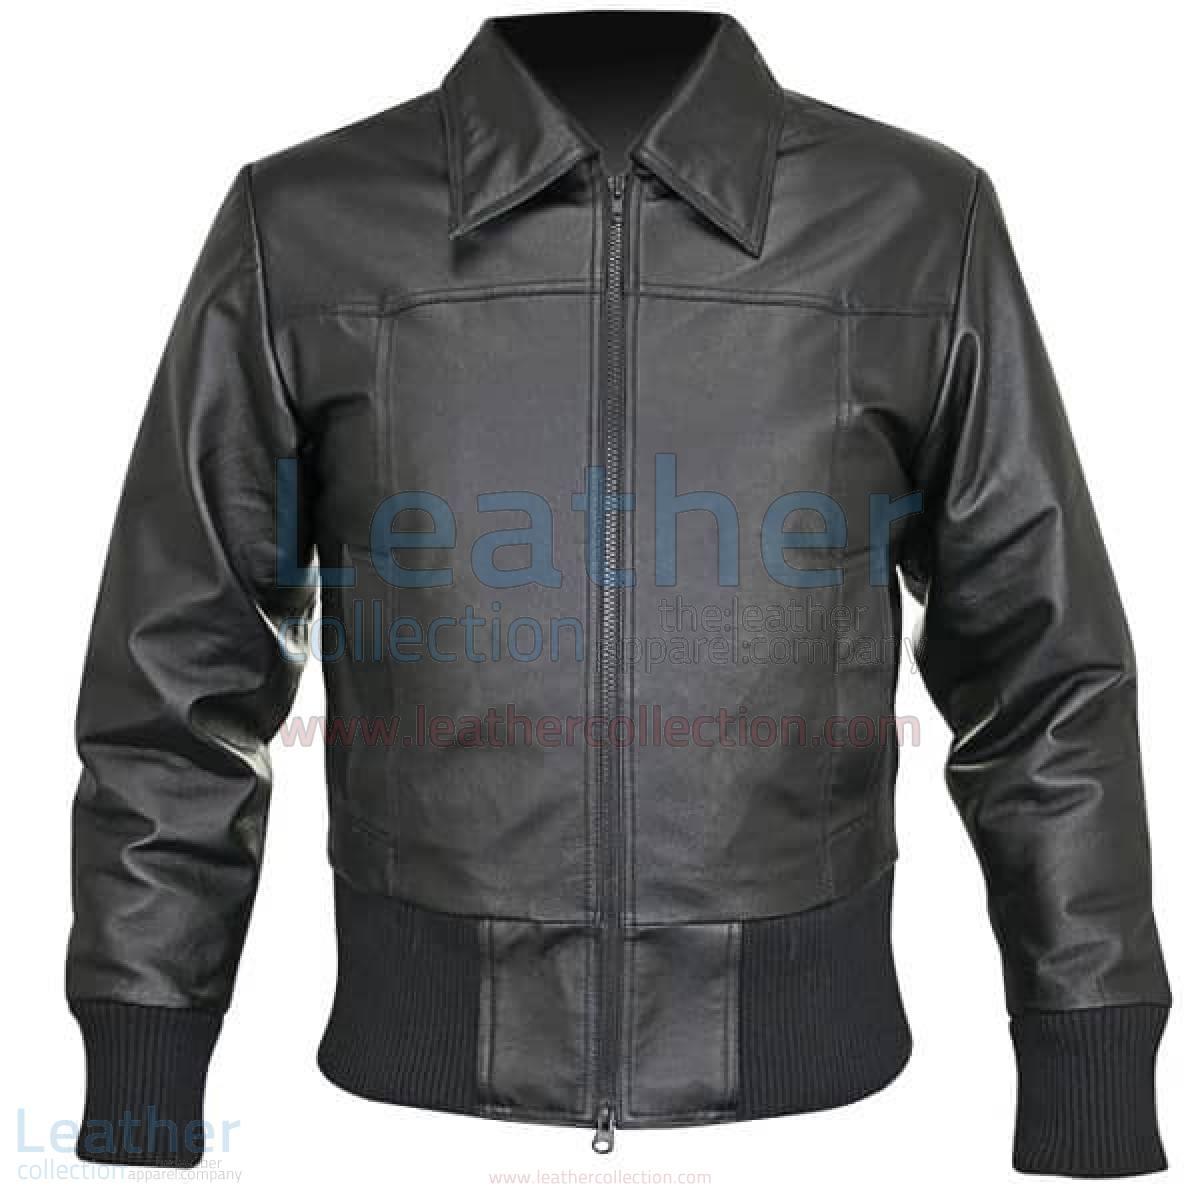 Rib Knit Waist Length Jacket of Leather